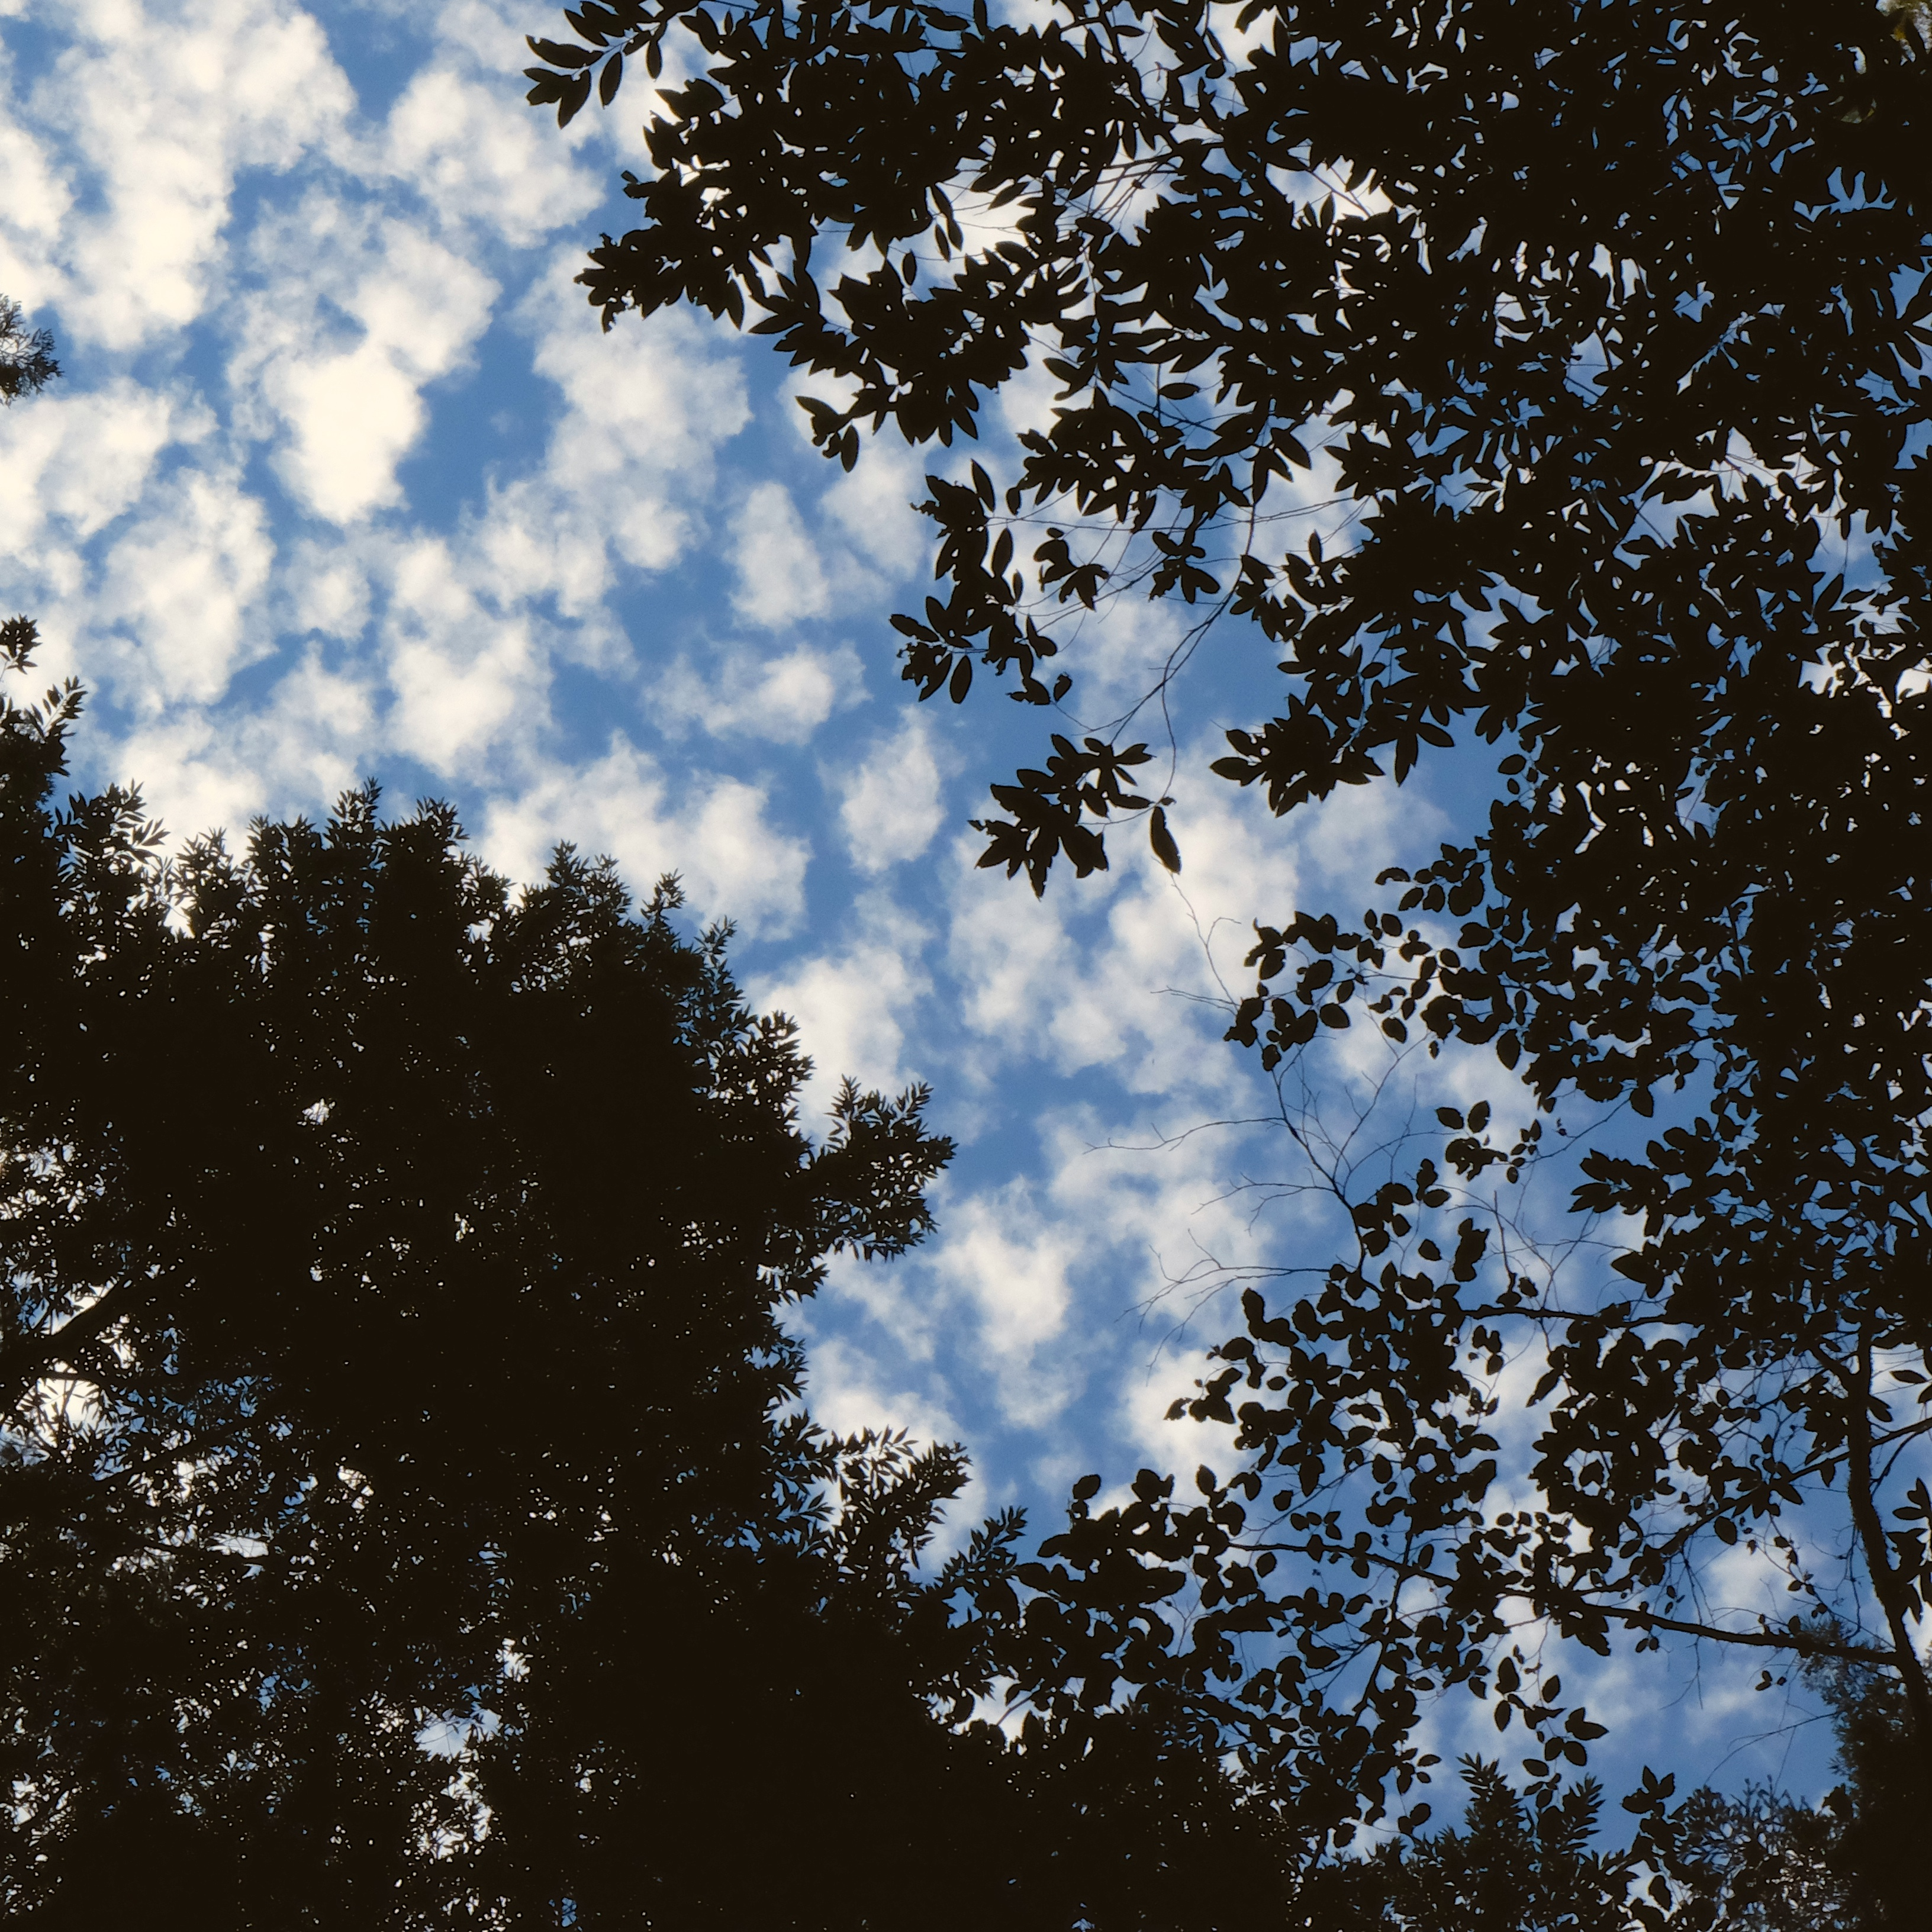 WITW15-TreeSky-Alla-DSCF1038